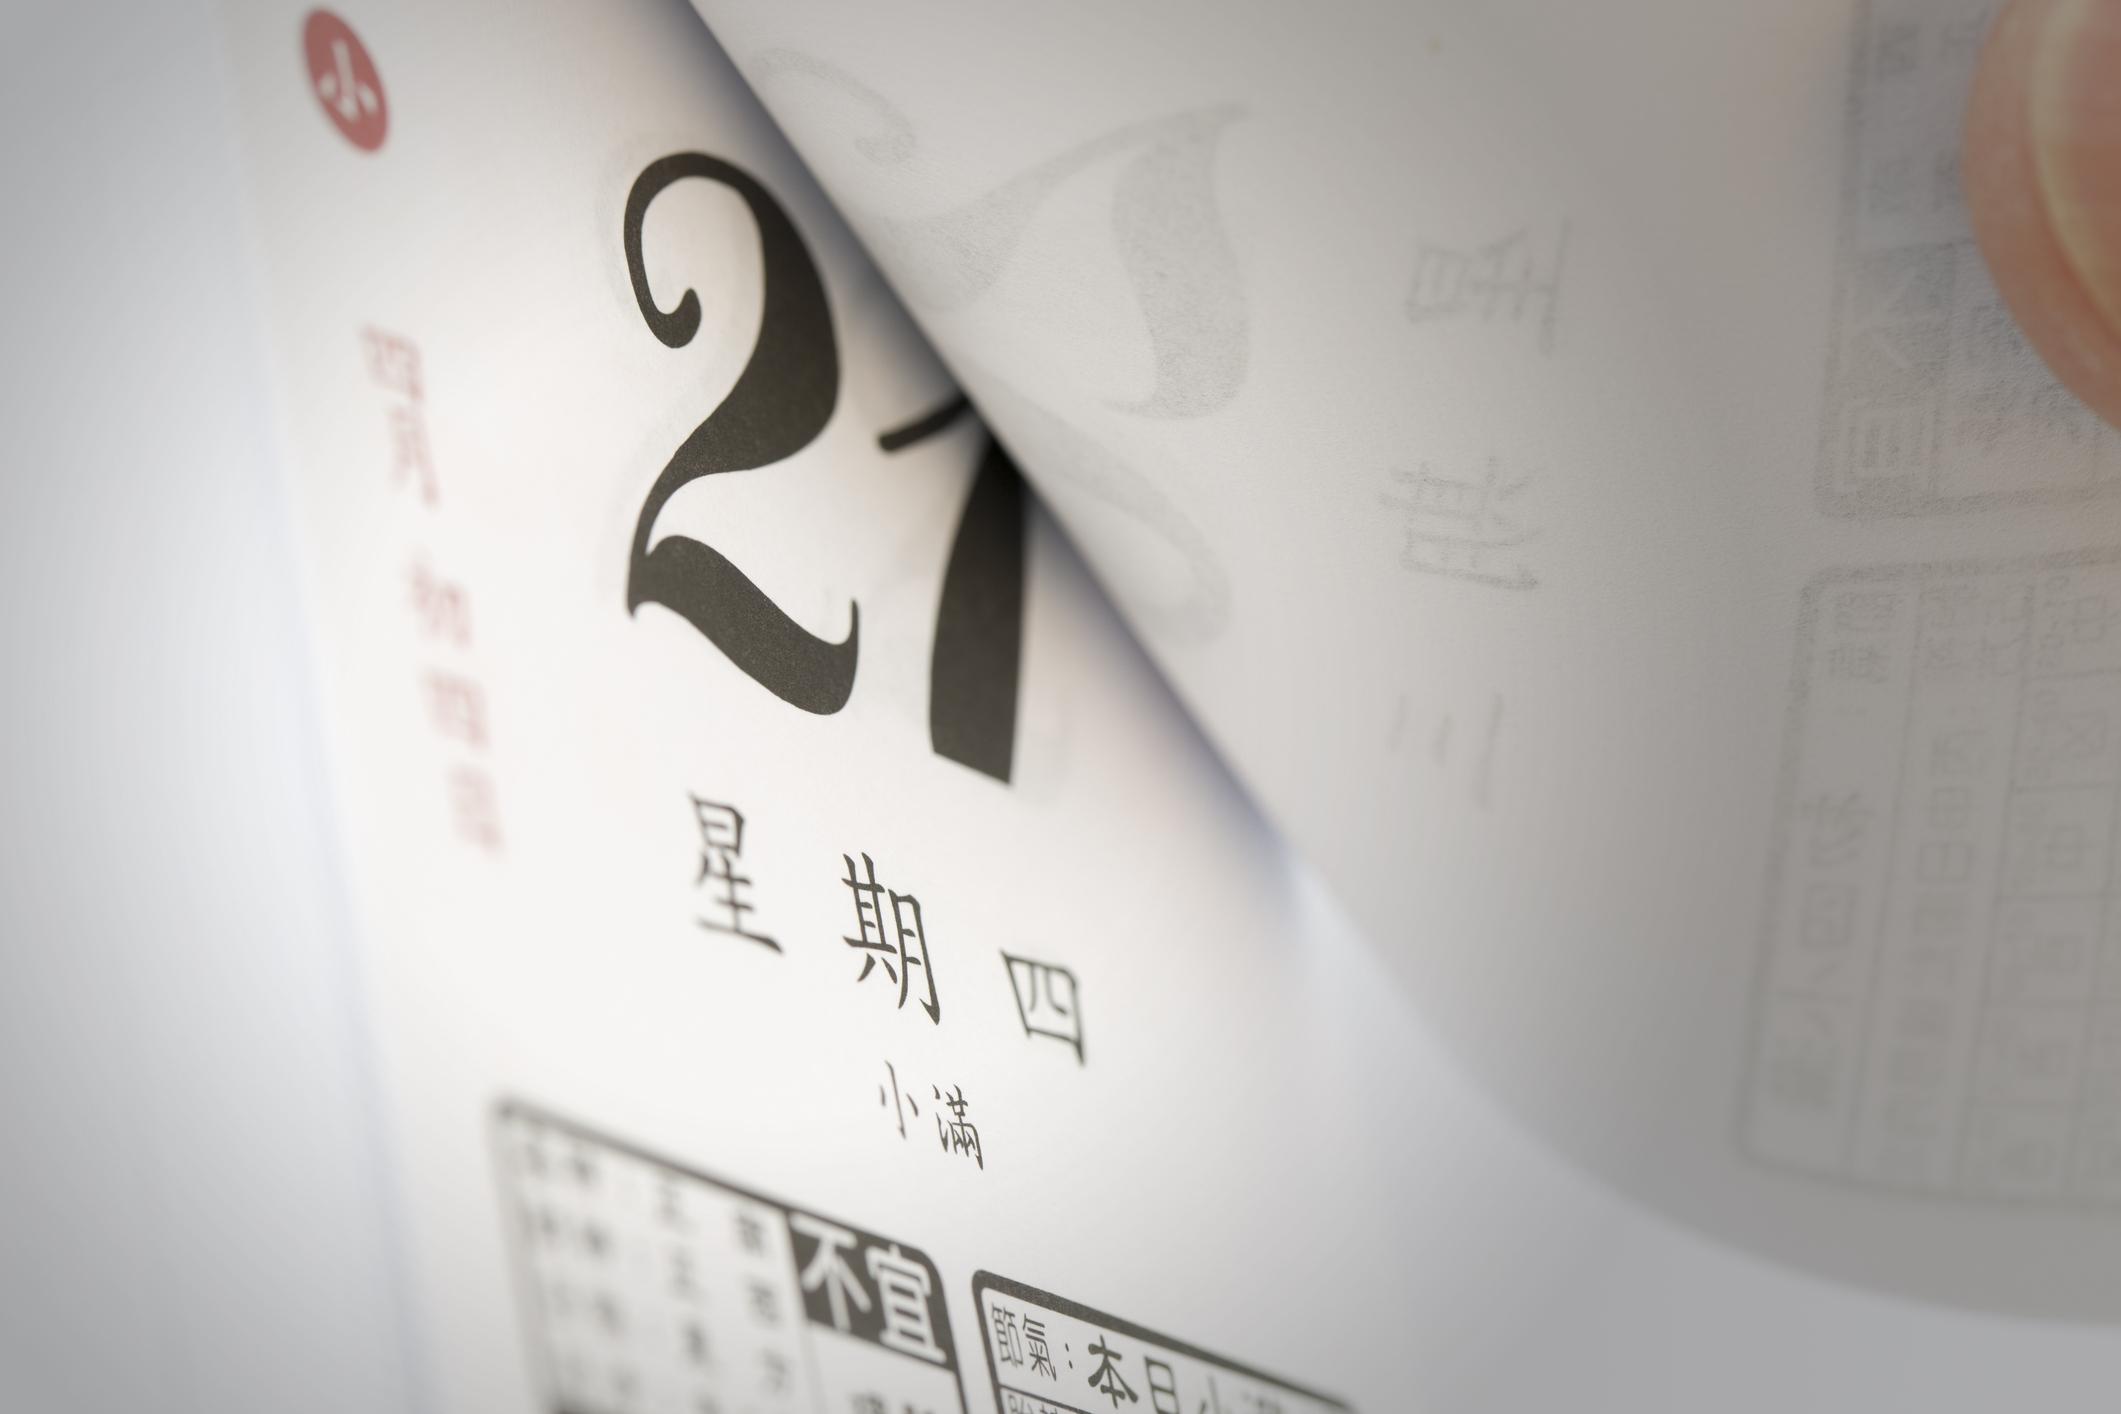 feng shui interior design 2019 calendar